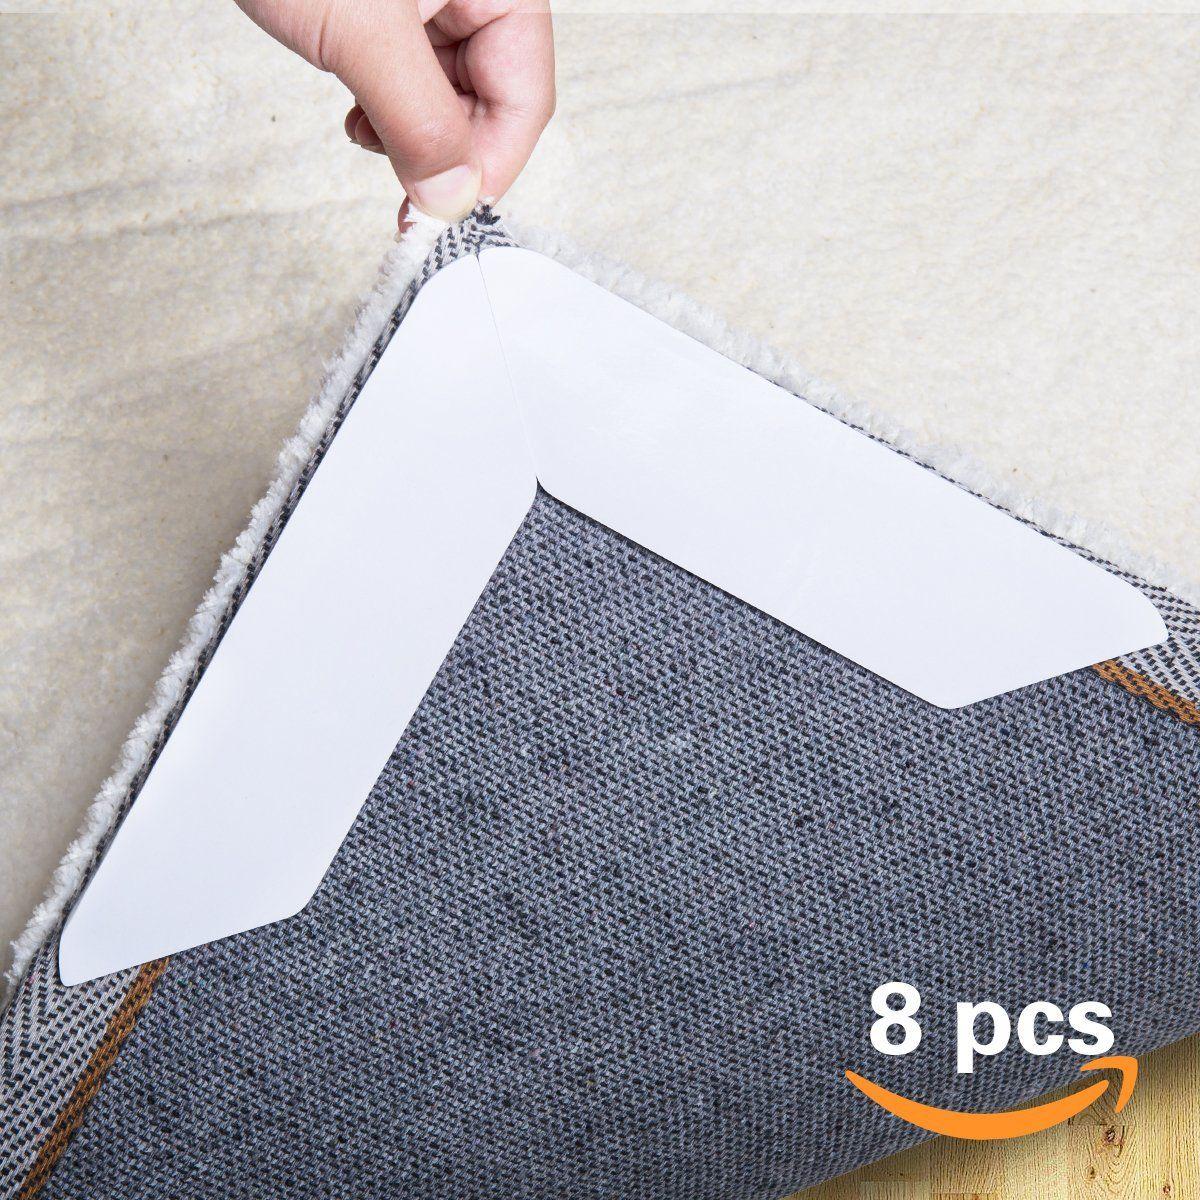 IDEALCRAFT Rug Gripper Non Slip Rug Pad Area rug pad